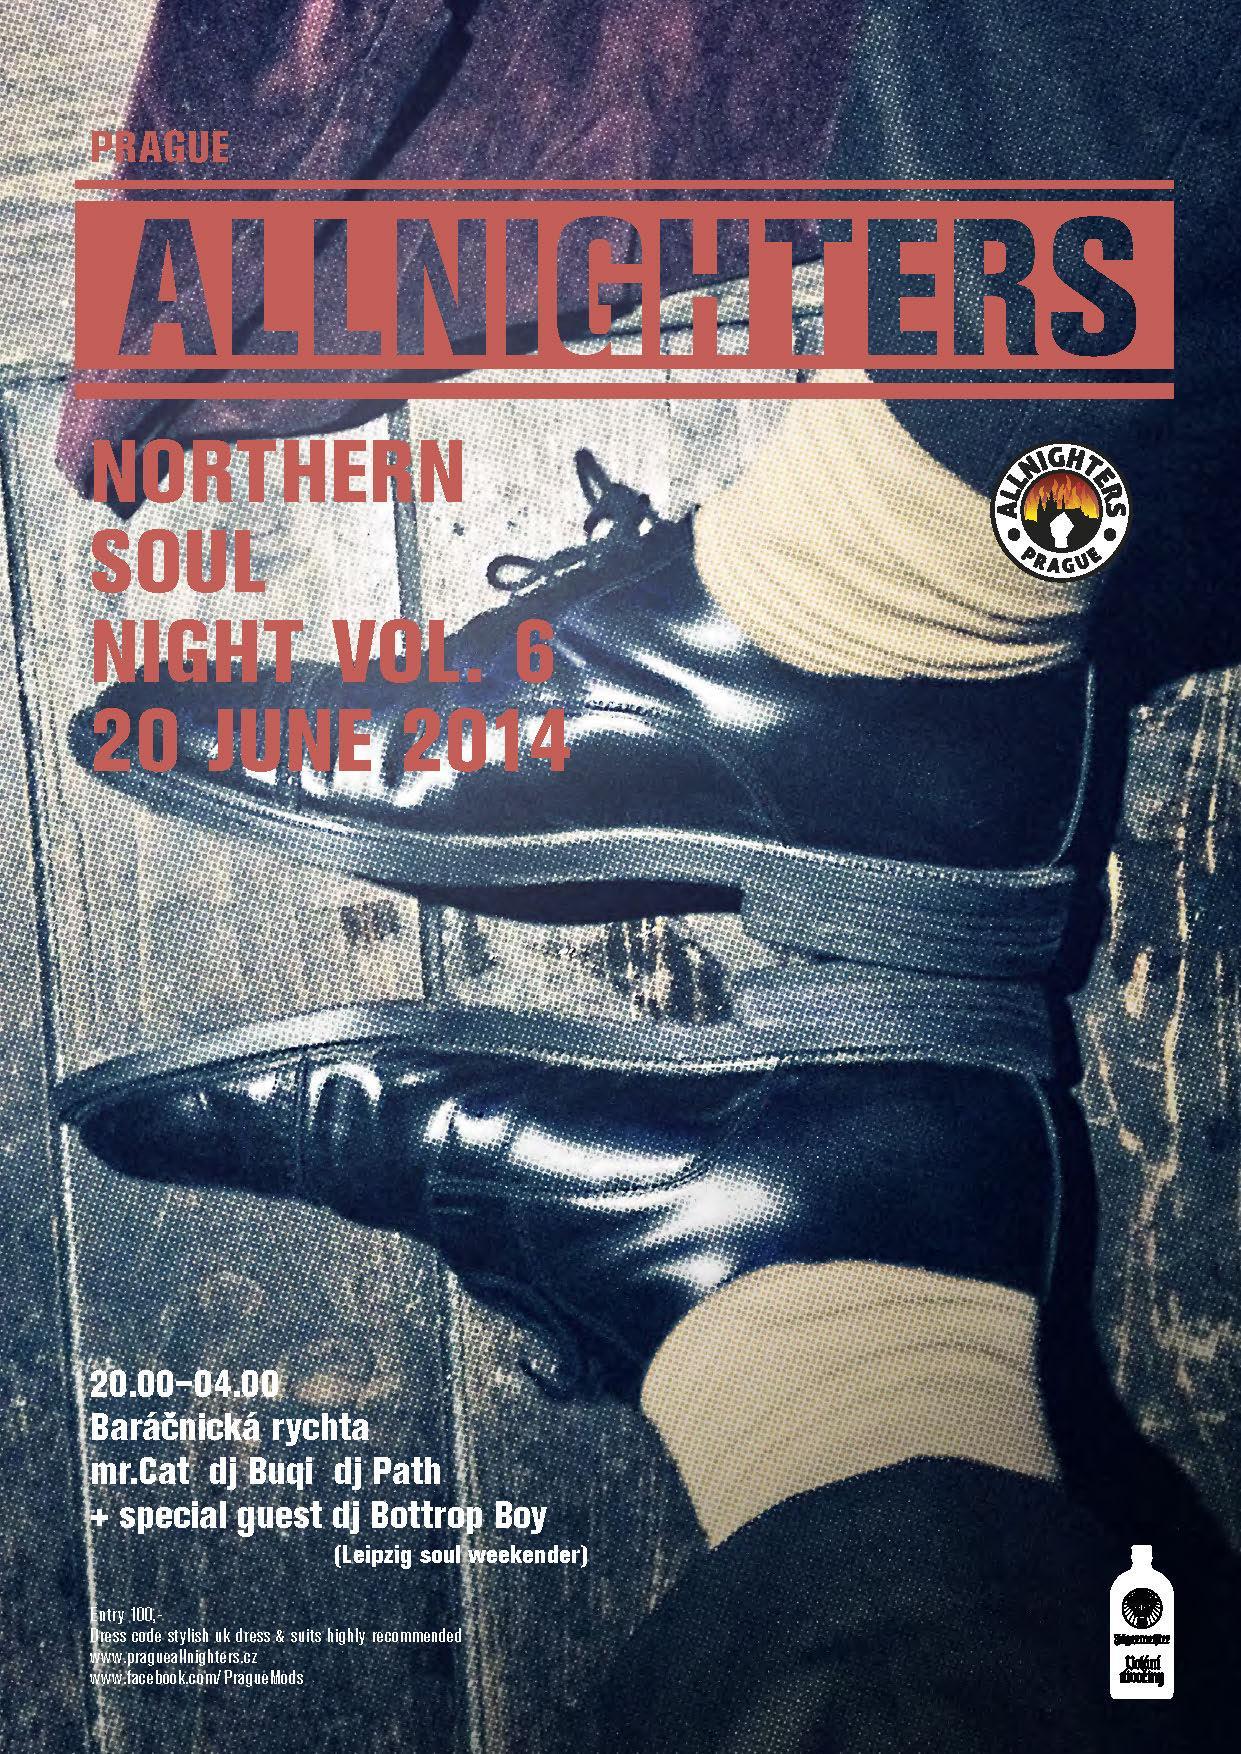 Prague+Allnighters+Vol.+VI.jpg